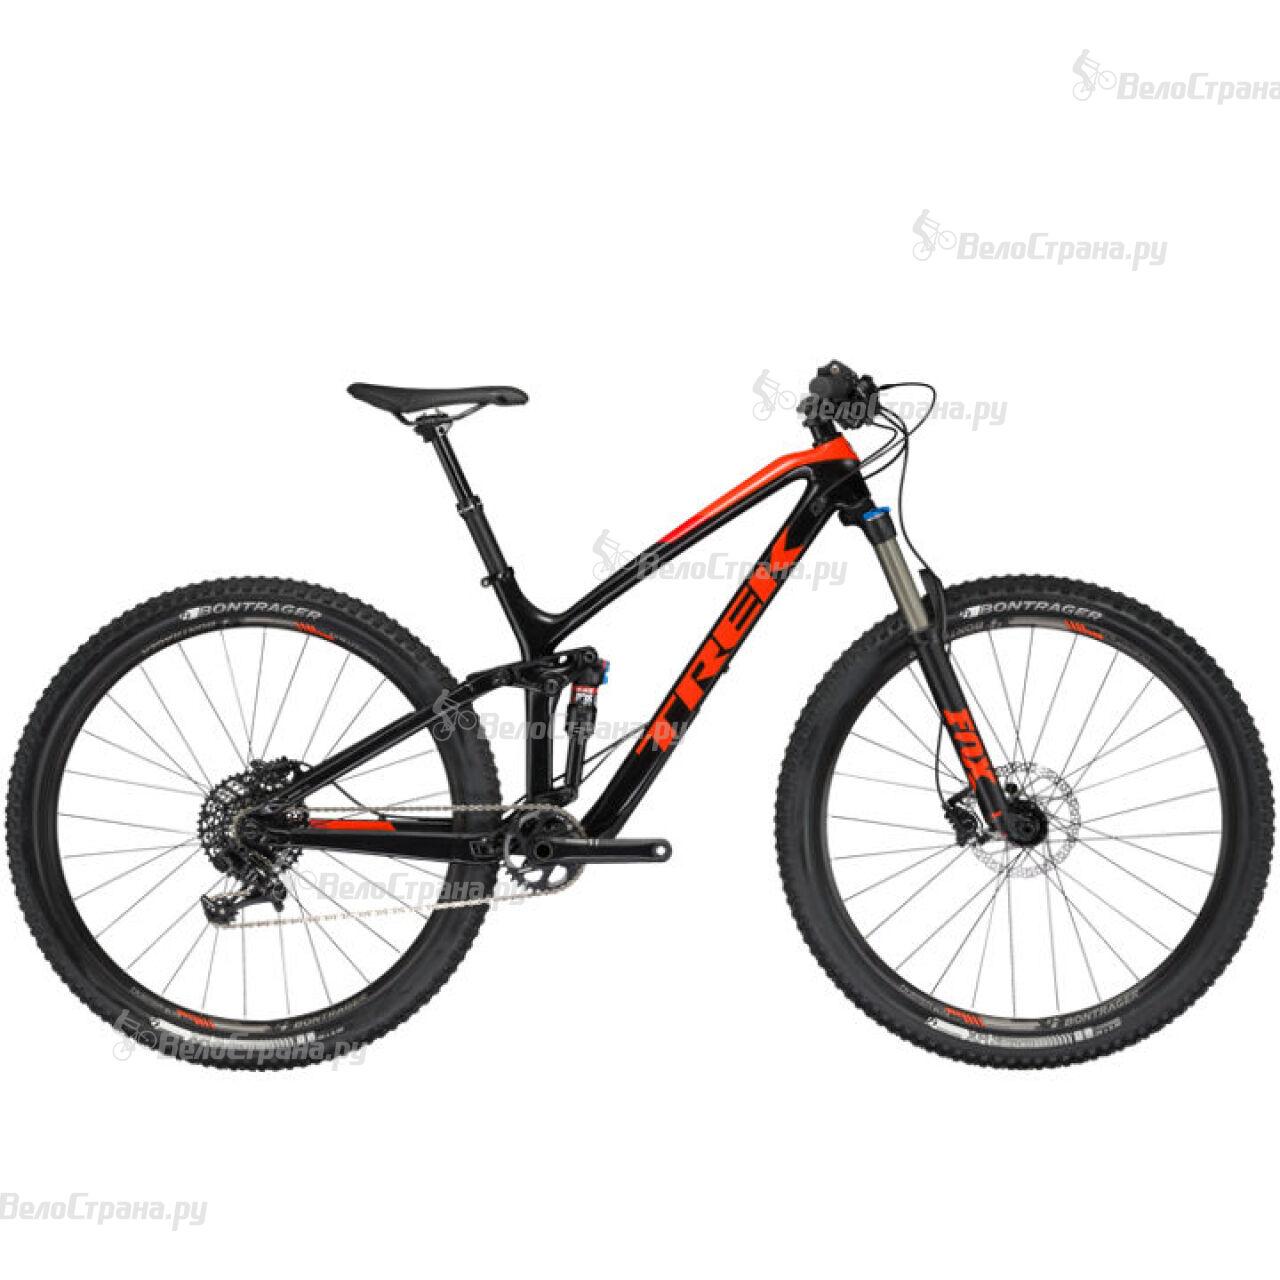 Велосипед Trek Fuel EX 9.7 29 (2017) велосипед trek fuel ex 9 29 2017